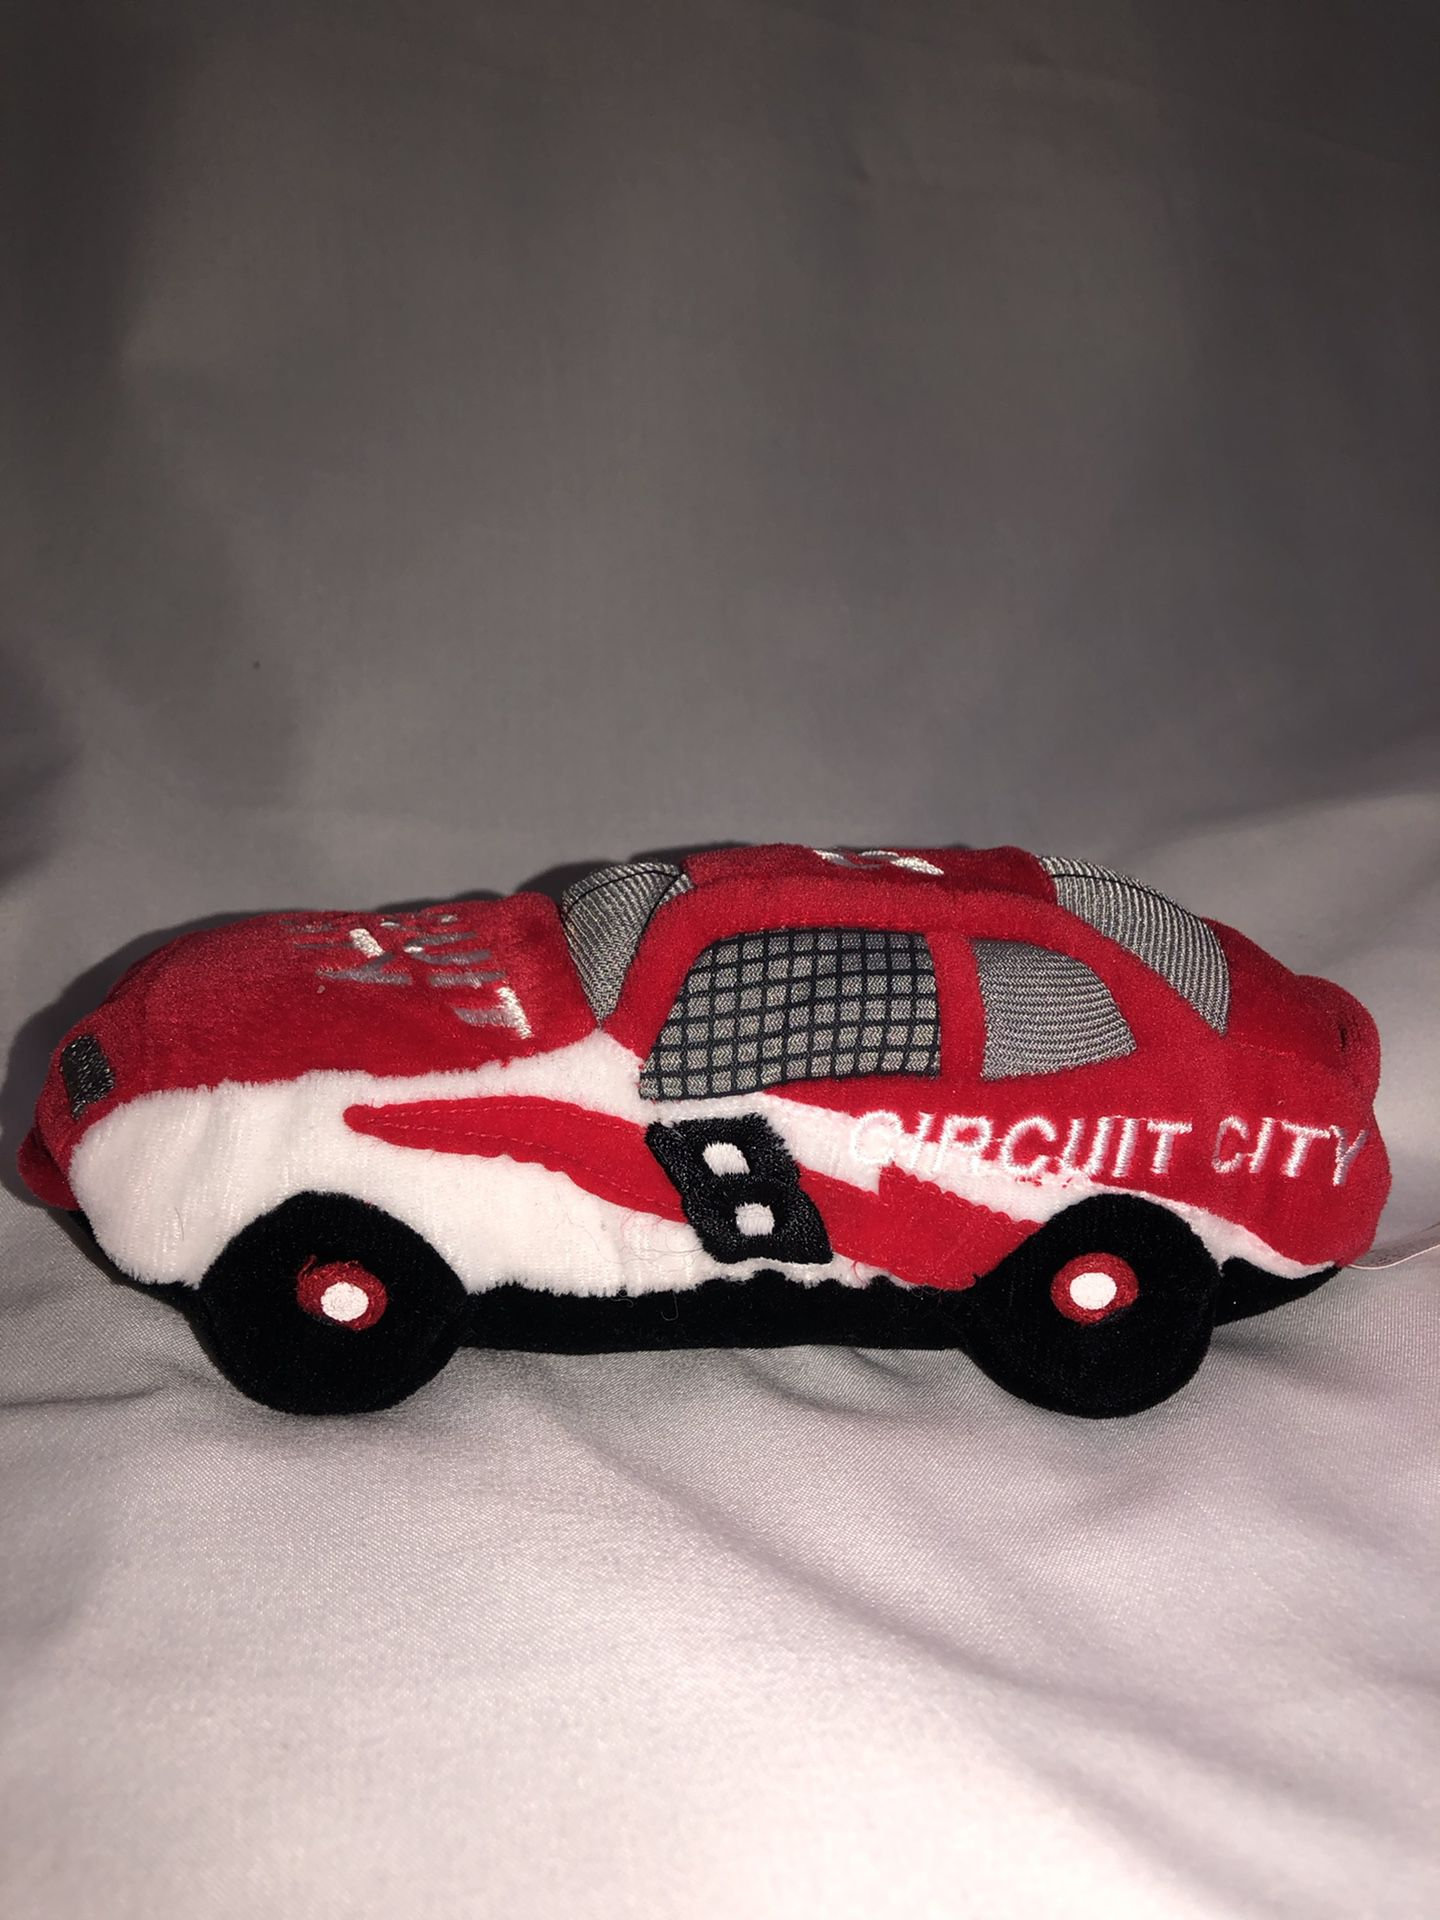 NASCAR beanie racer CIRCUIT CITY #8 Hut Stricklin